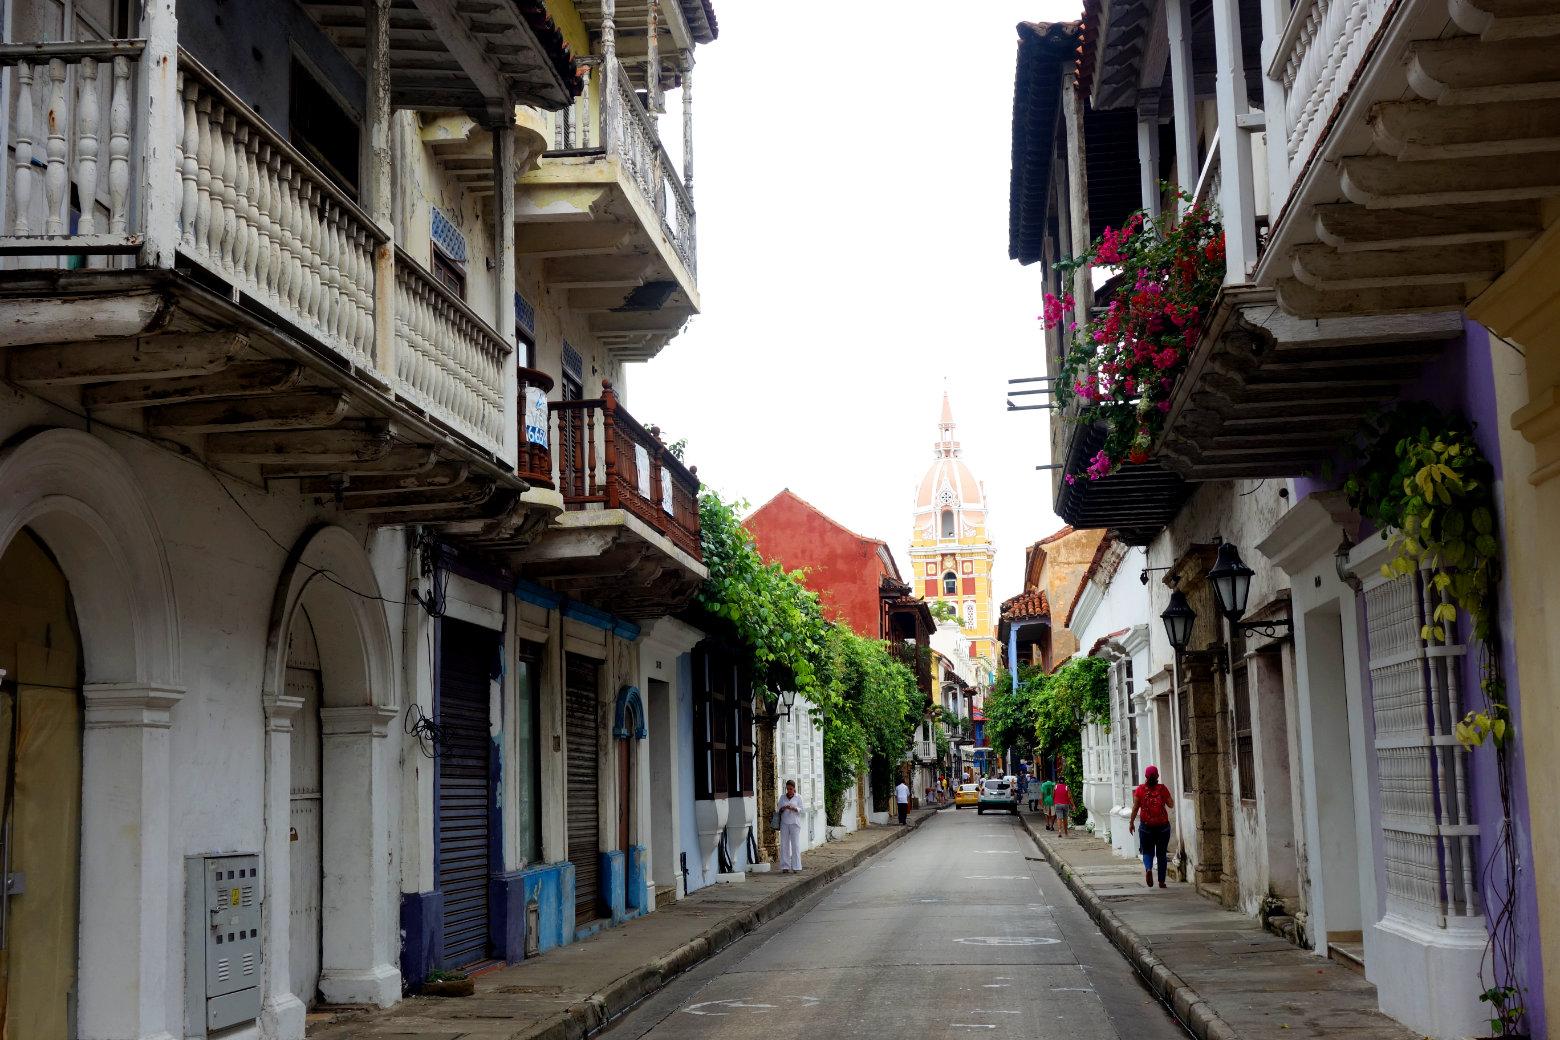 Cartagena Innenstadt mit Kolonialhäusern